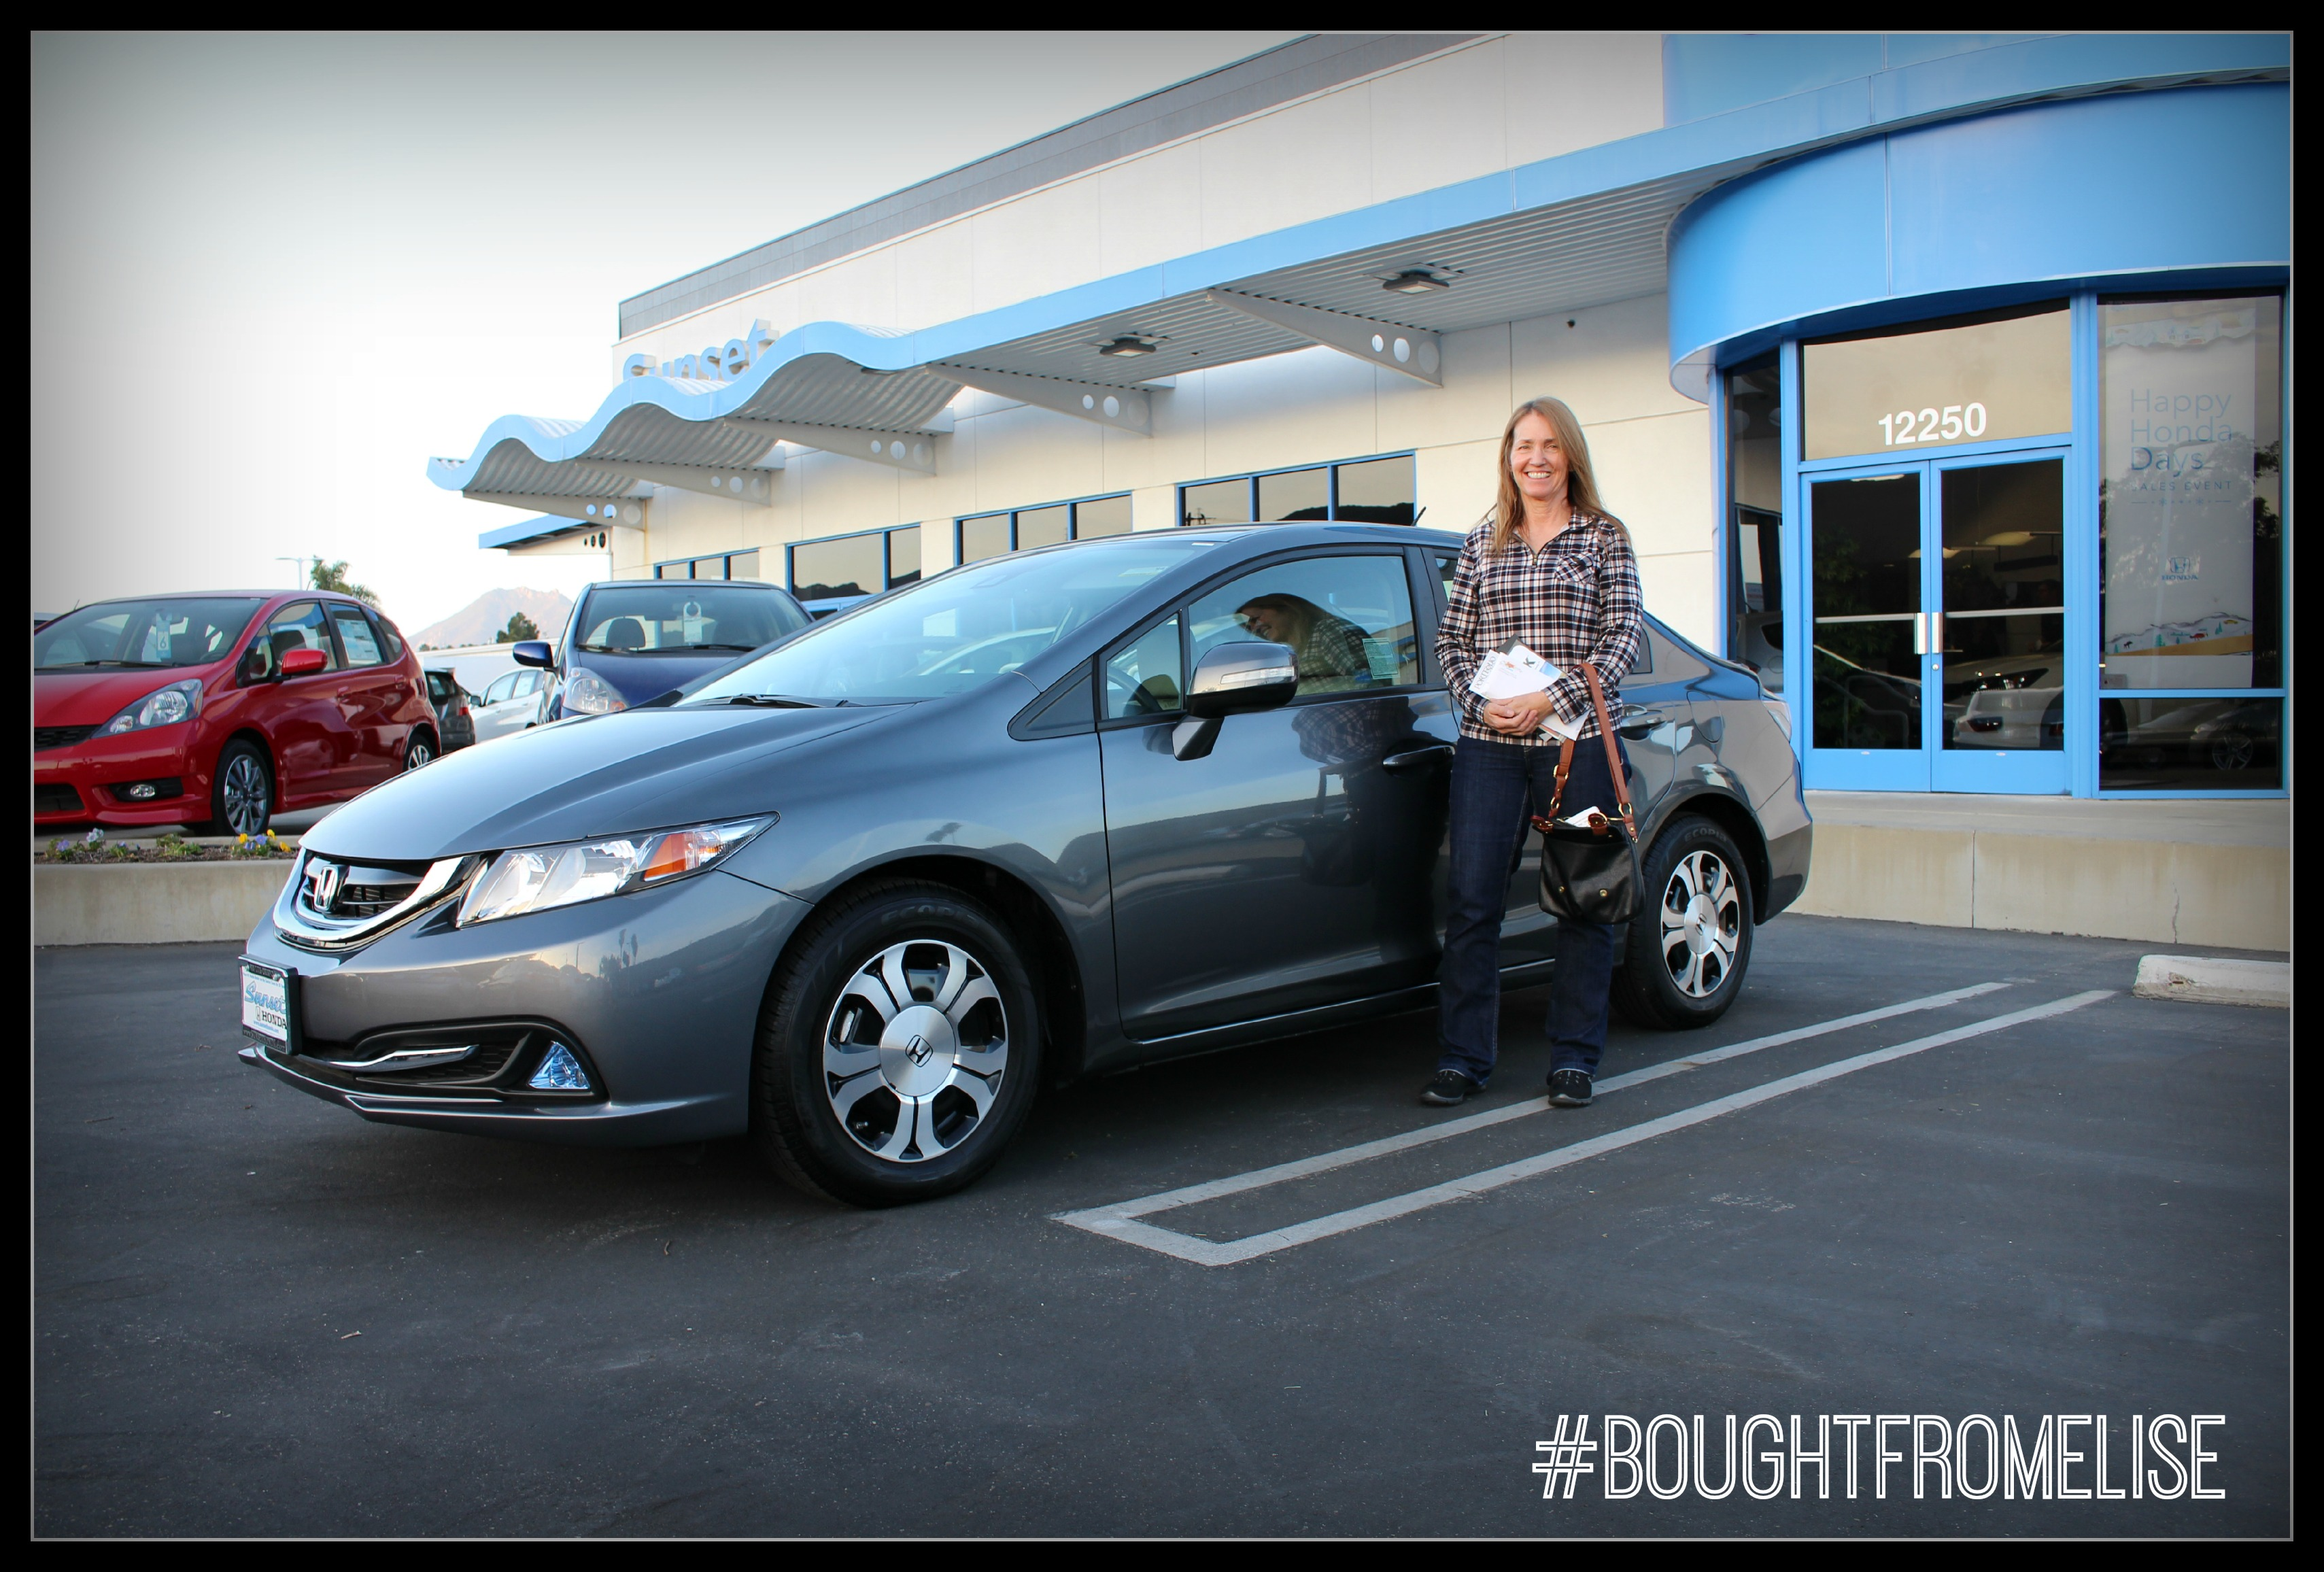 Meet Laurel: Bought A Honda From Elise At Sunset Honda In San Luis Obispo